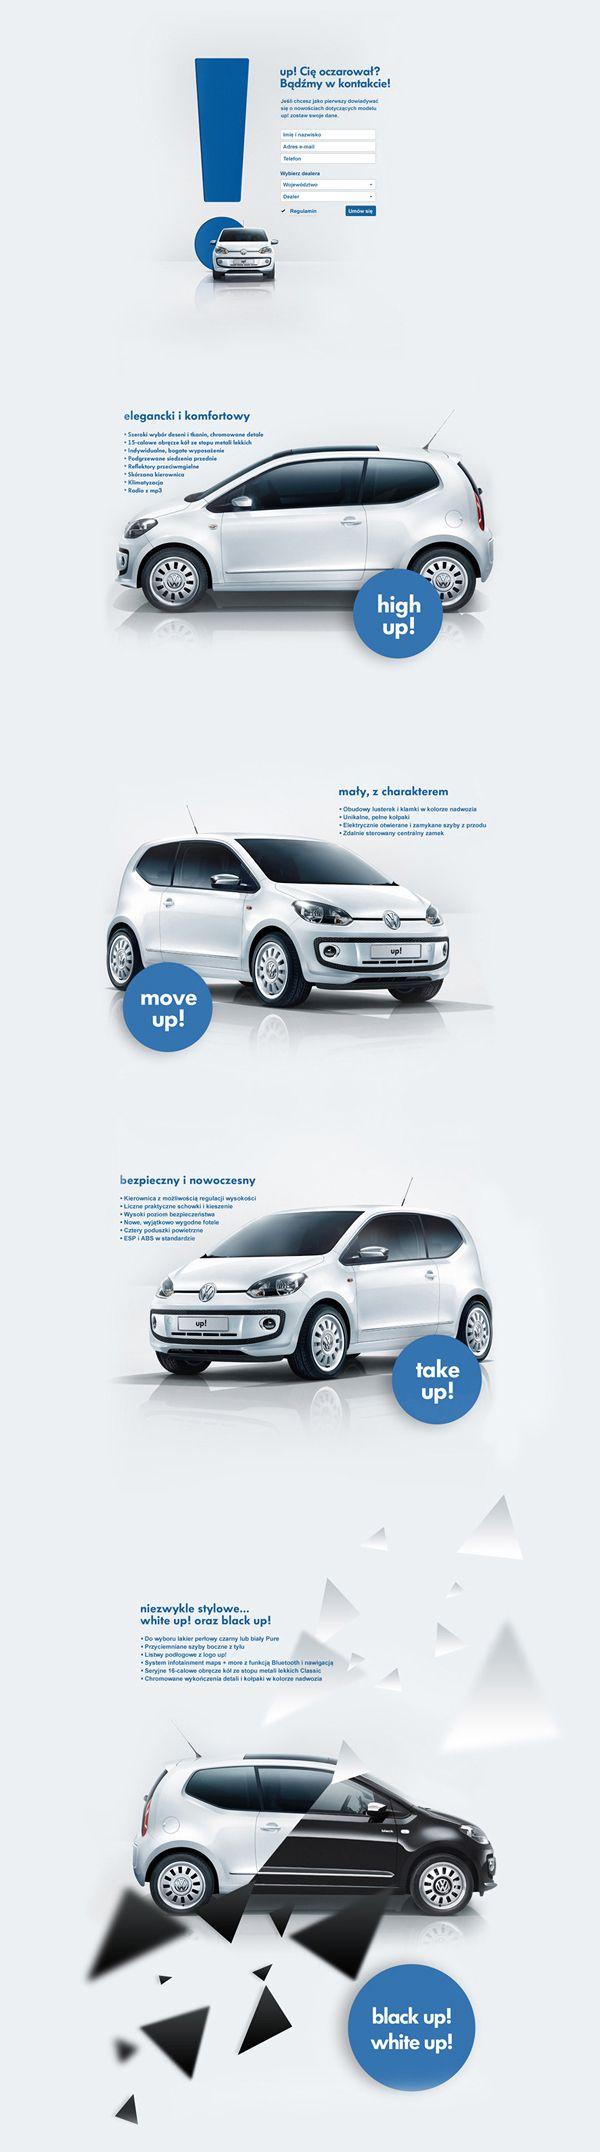 Volkswagen up! by Malgorzata Studzinska, via Behance    http://www.behance.net/gallery/Volkswagen-up/4664169